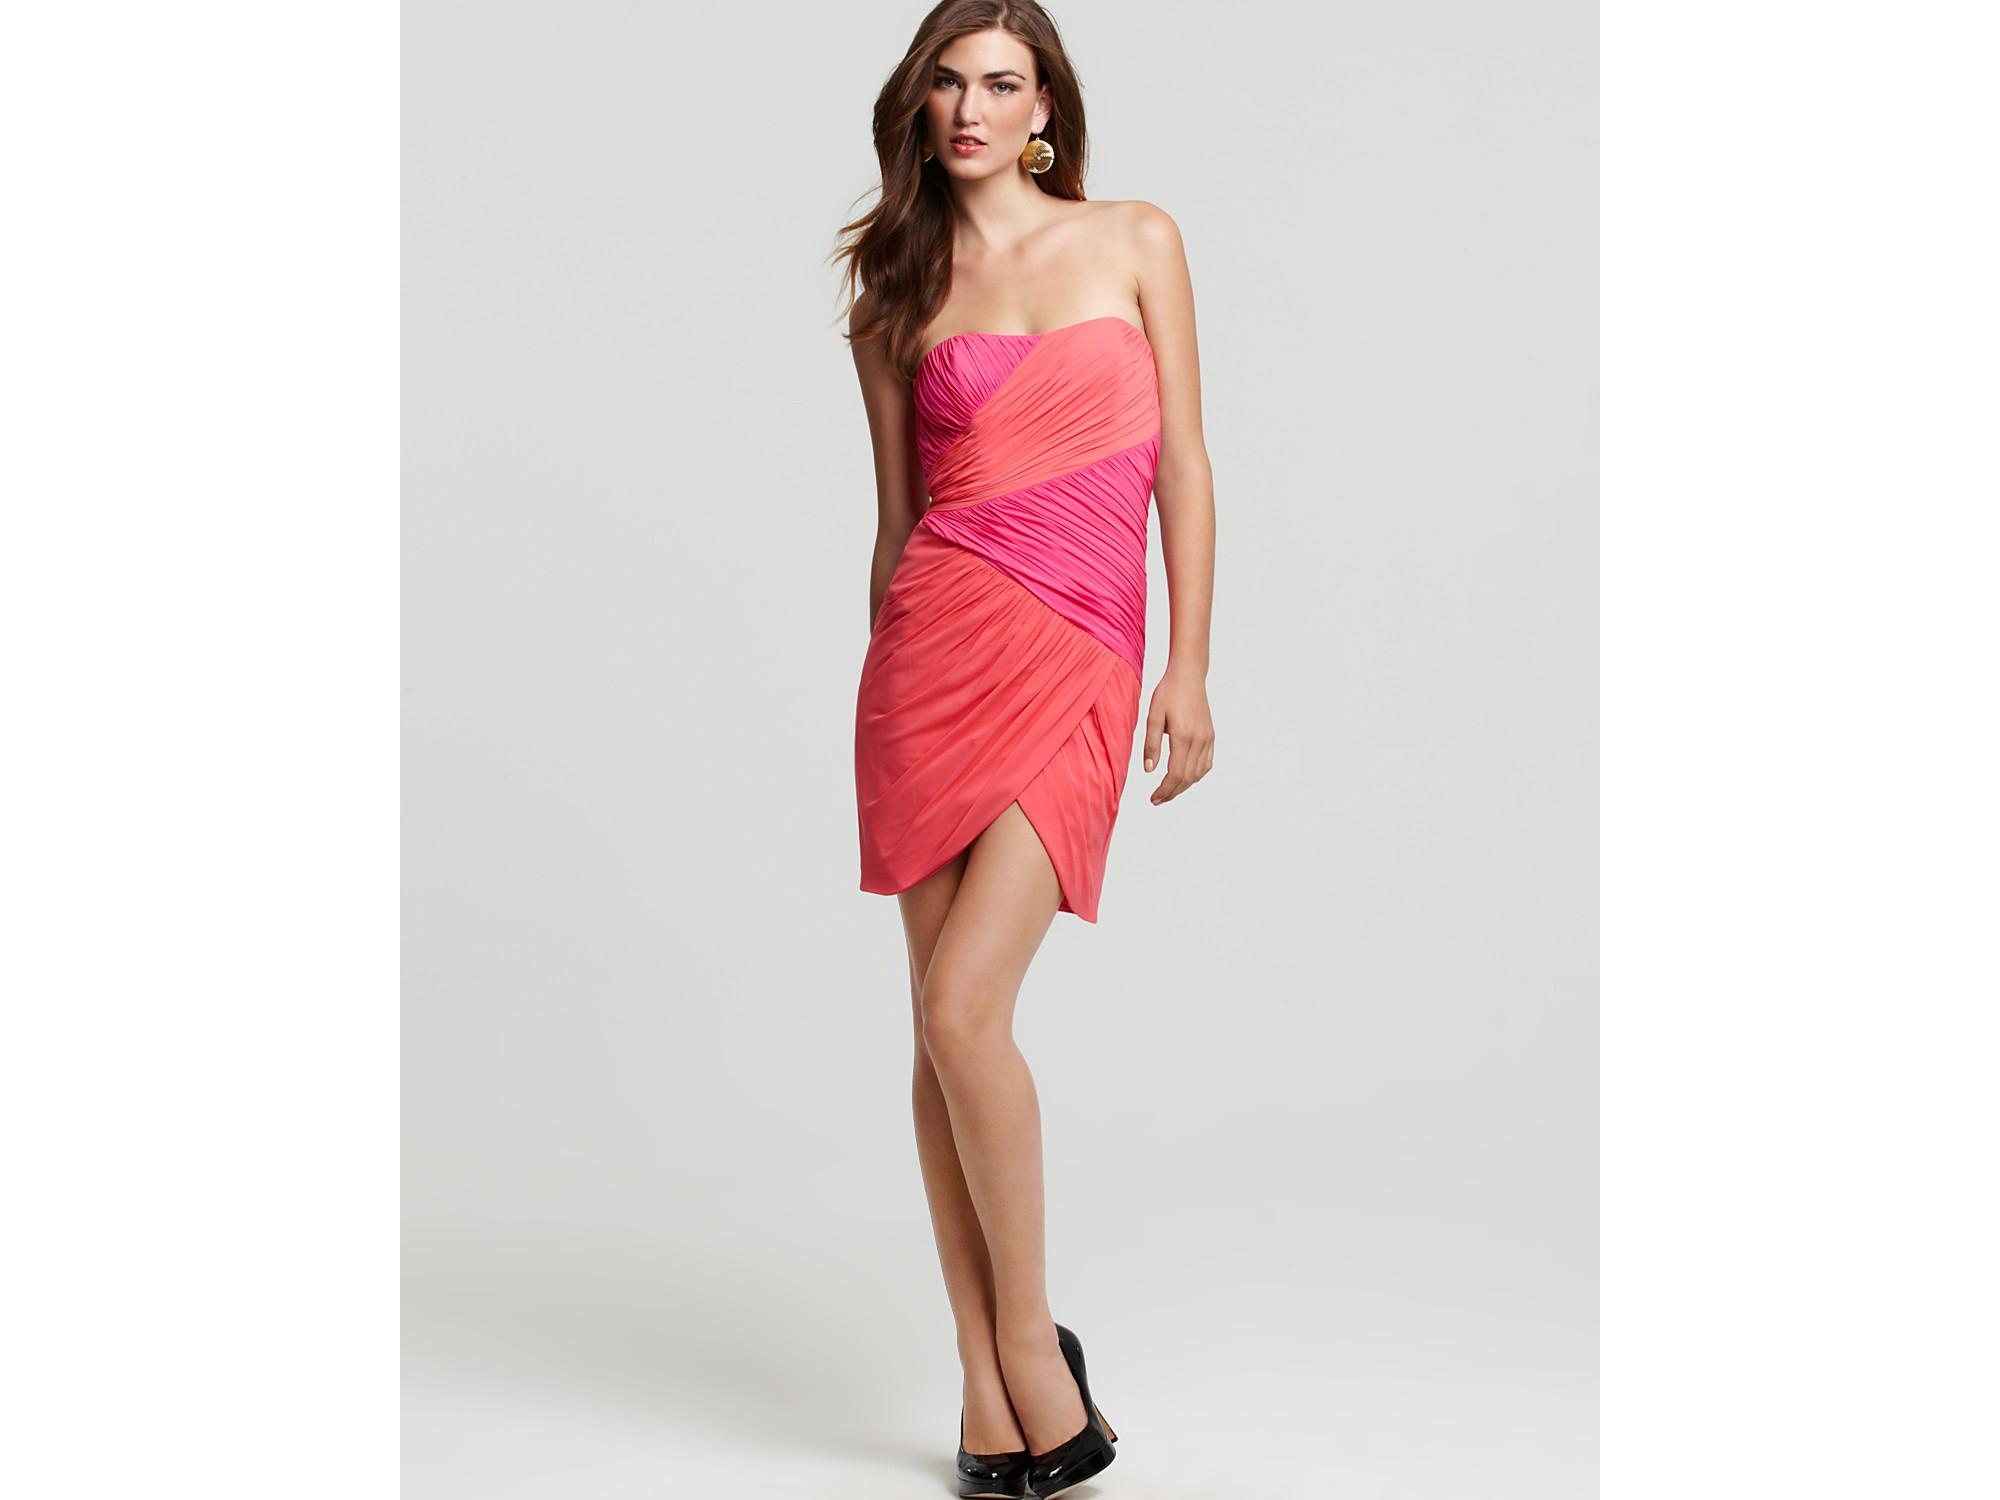 Jill stuart strapless ruched lace dress